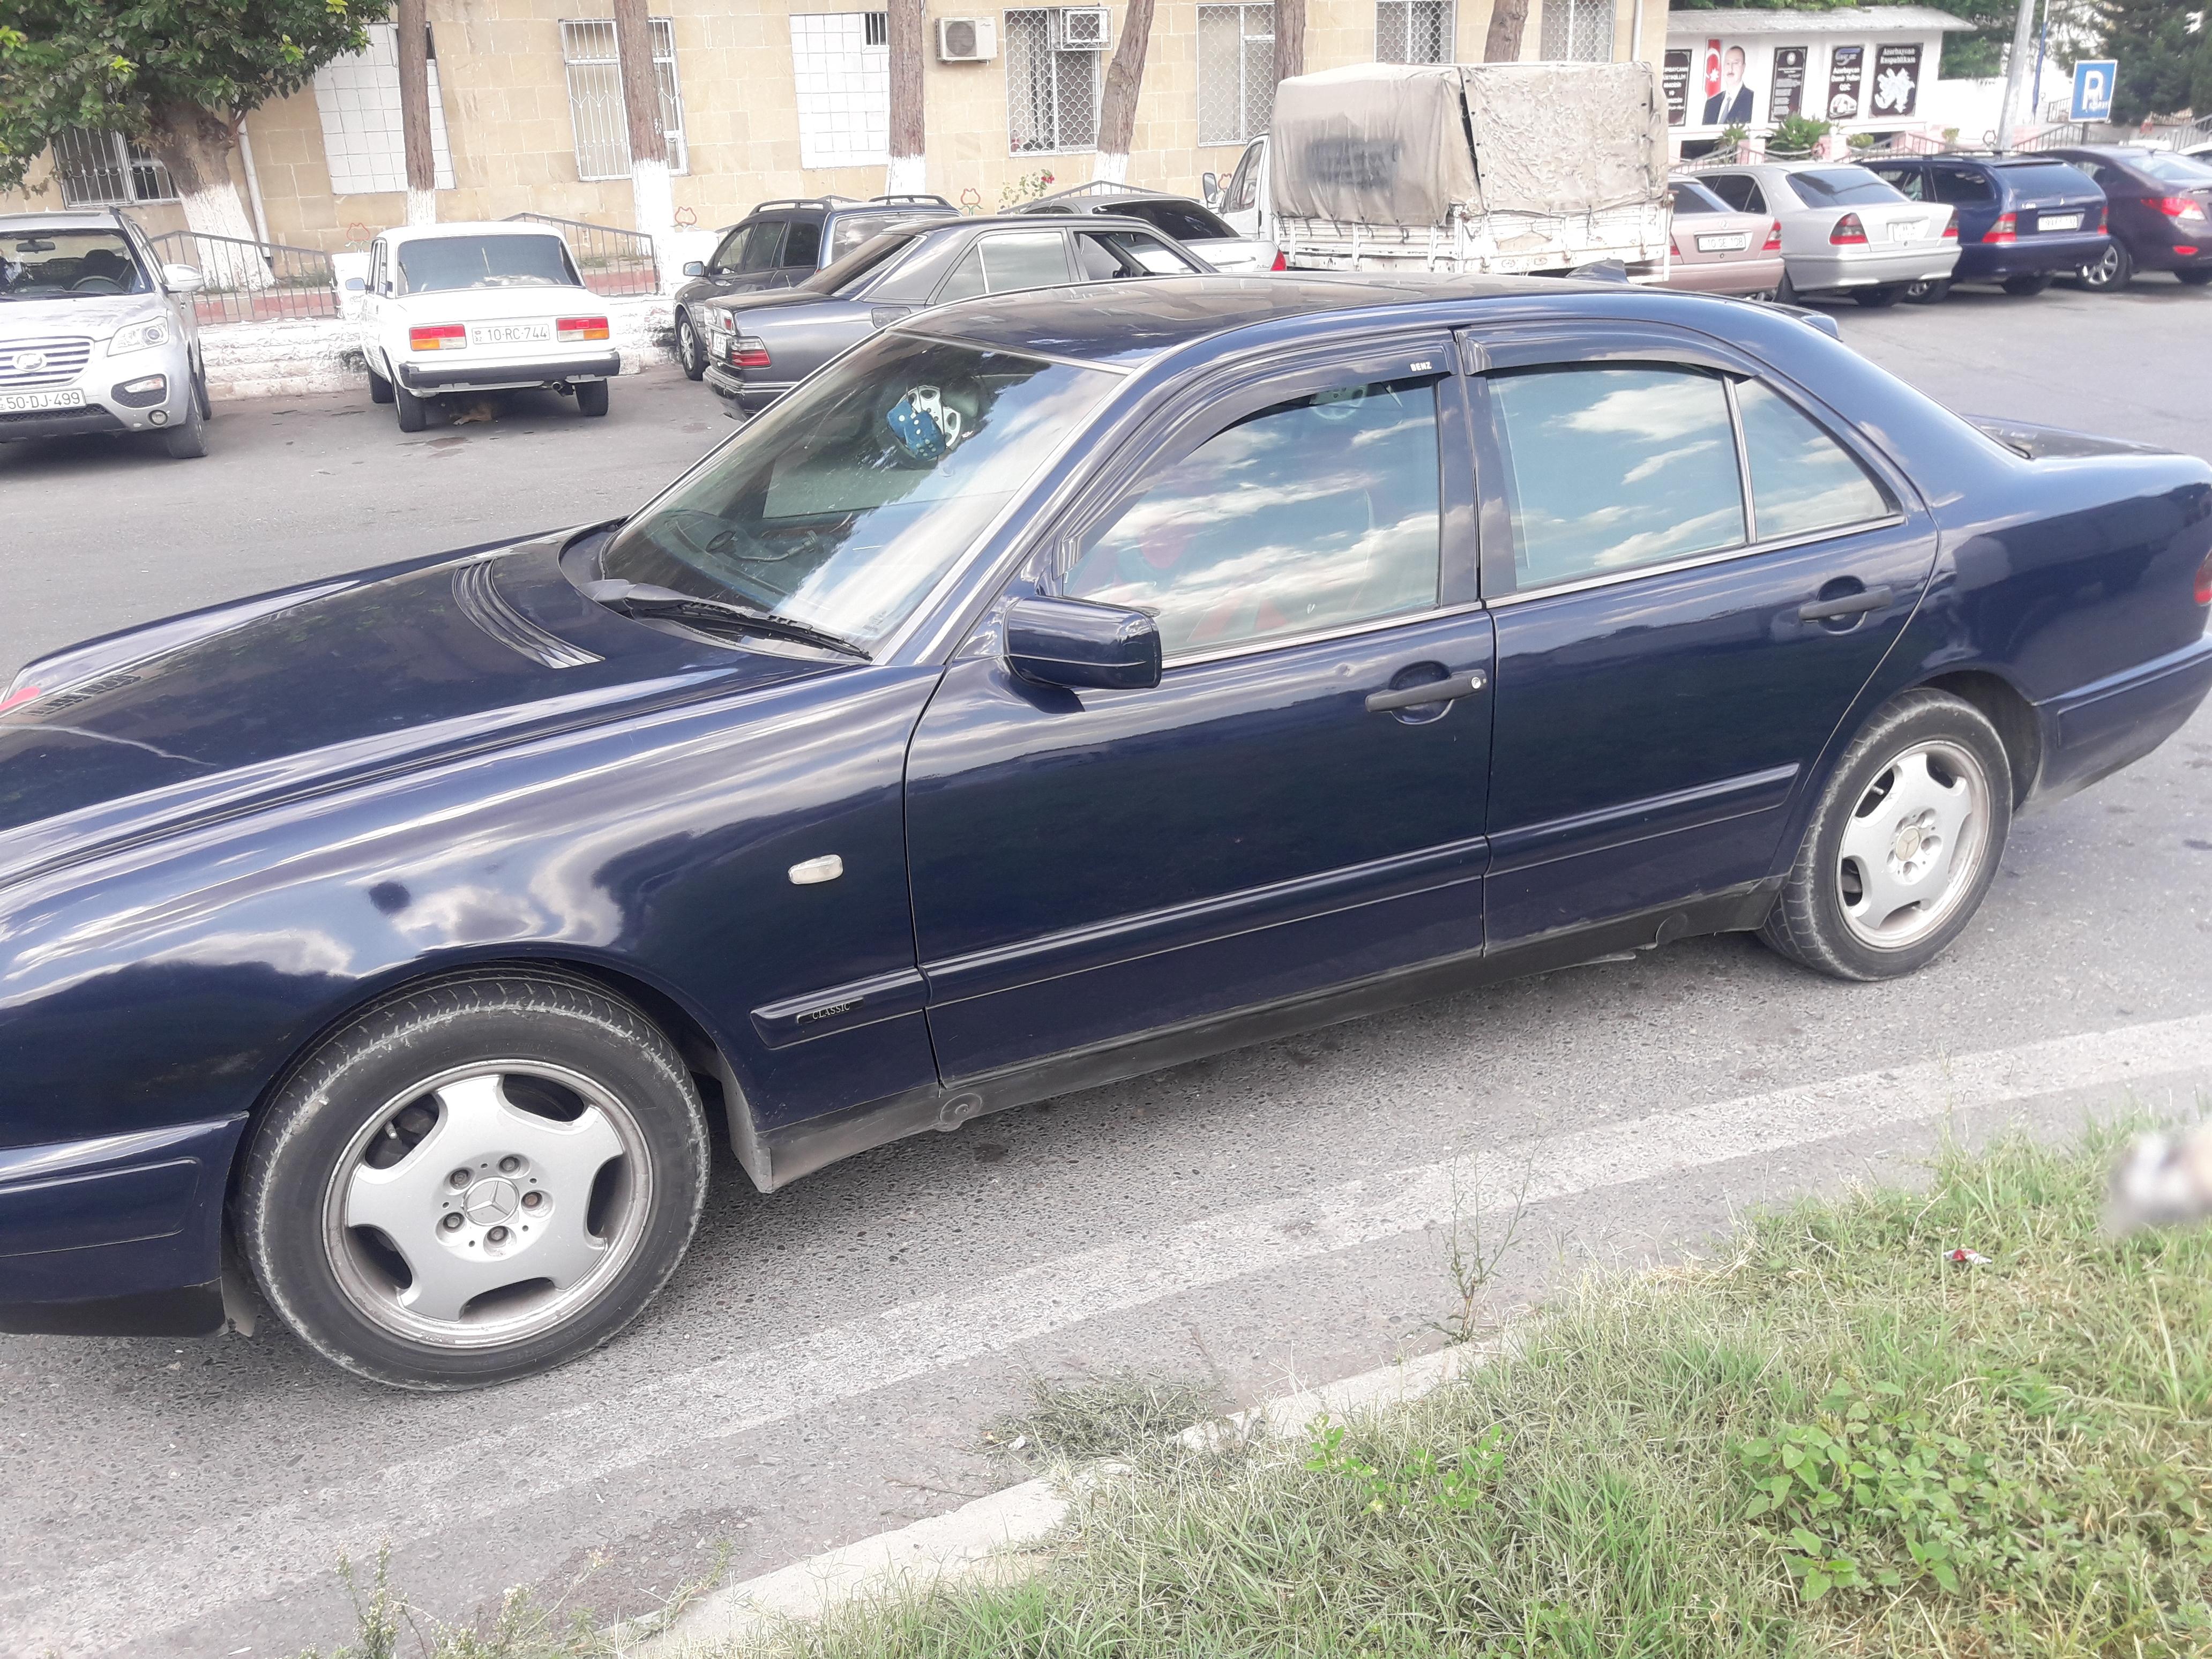 Mercedes-Benz E 220 2.2(lt) 1998 İkinci əl  $7400